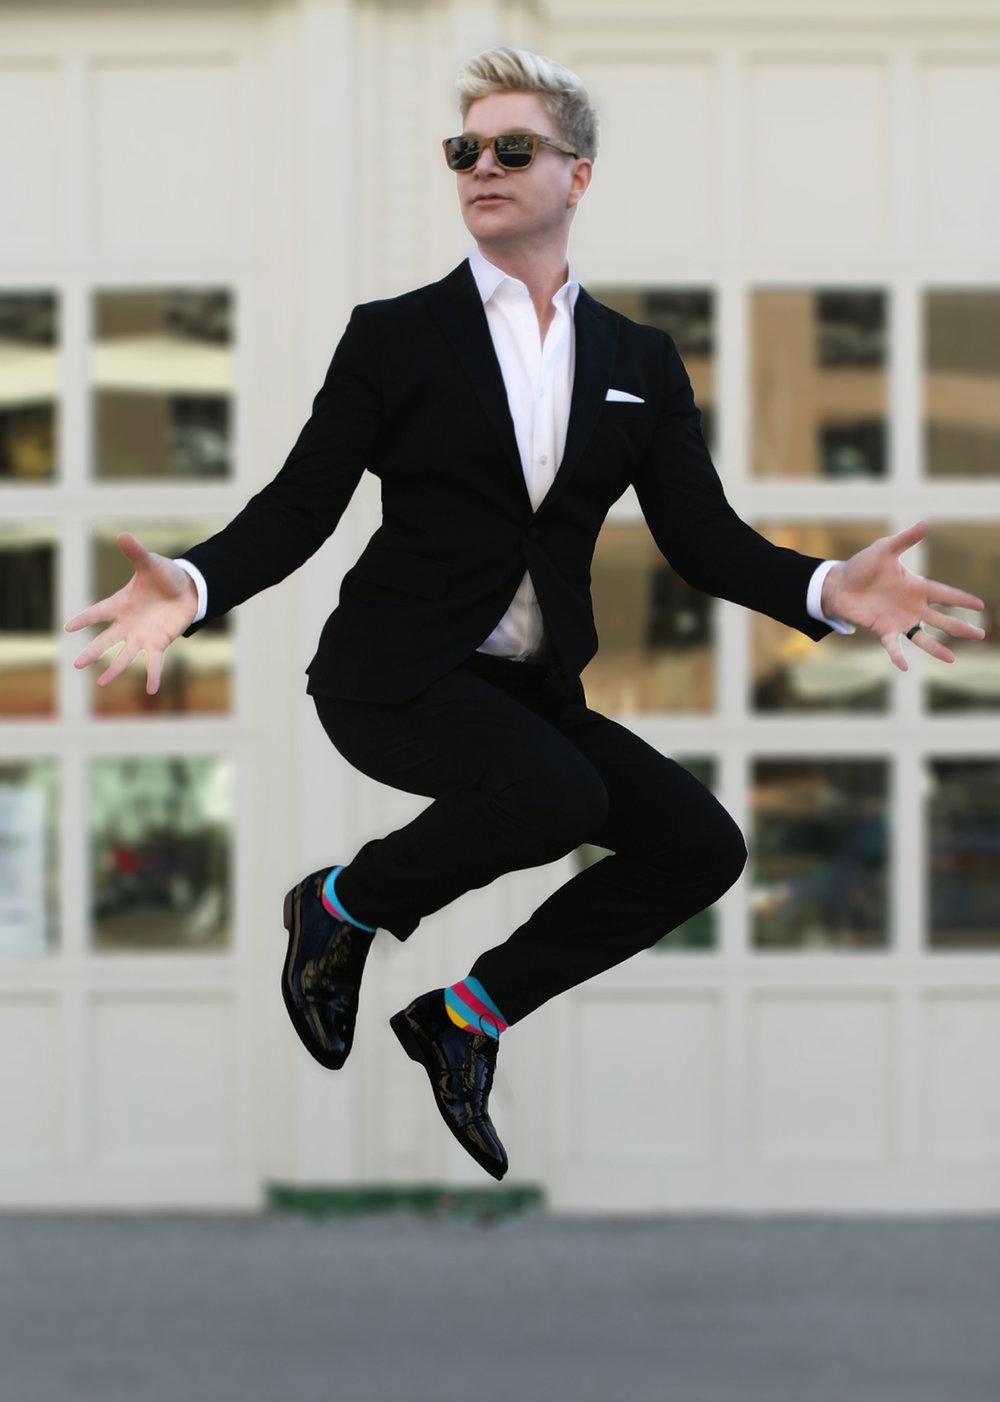 jumping phoo.jpg